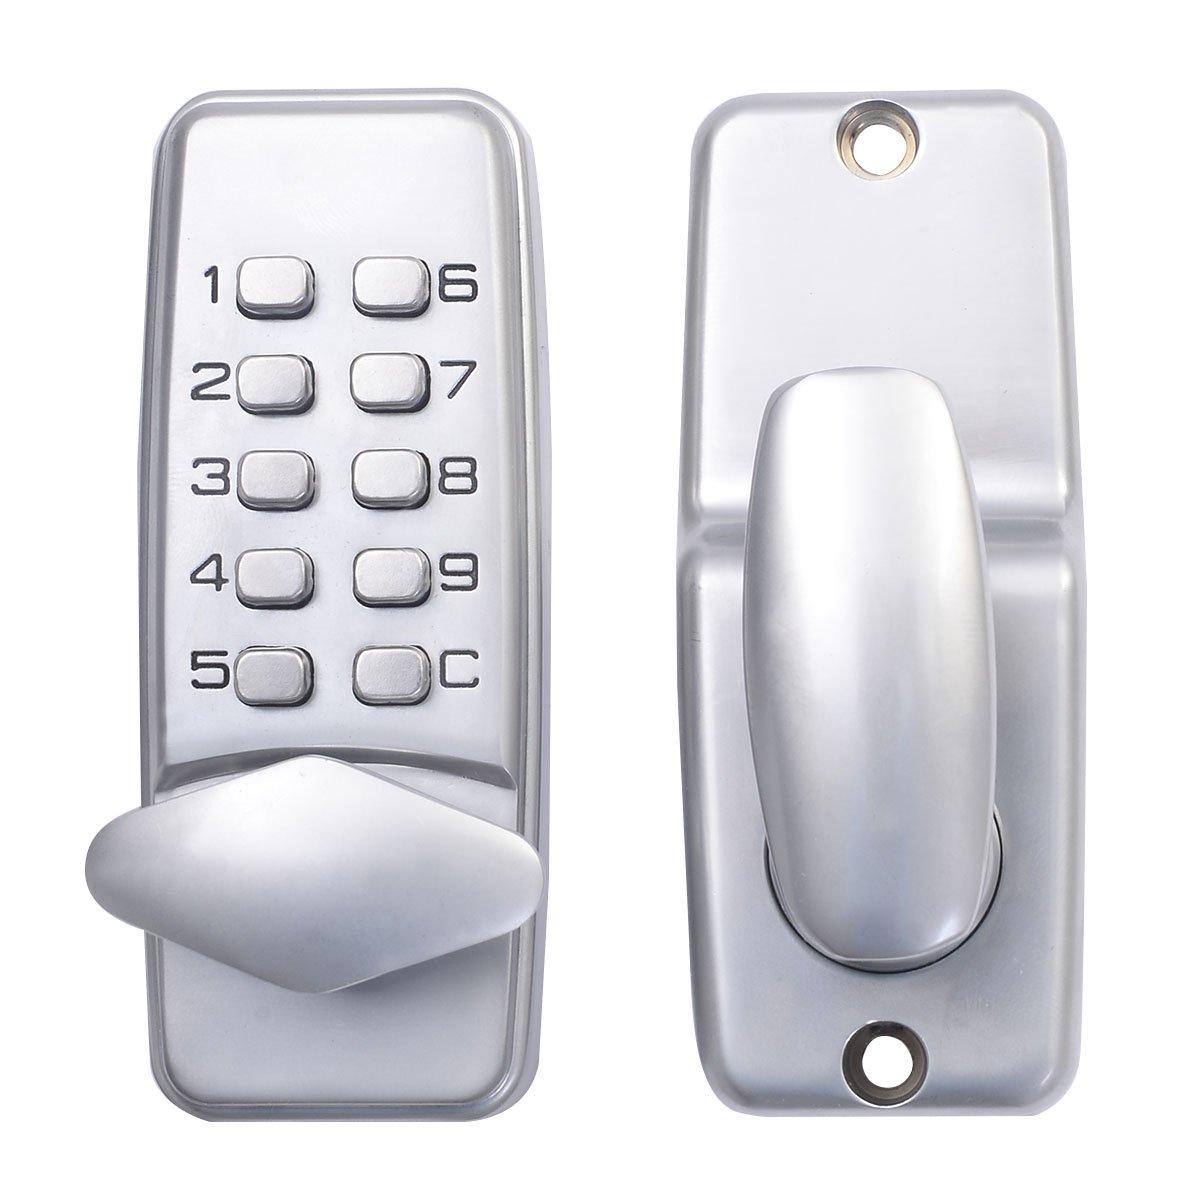 Safstar Keyless Mechanical Keypad Code Digital Locker Home Entry Security Safety Door Lock